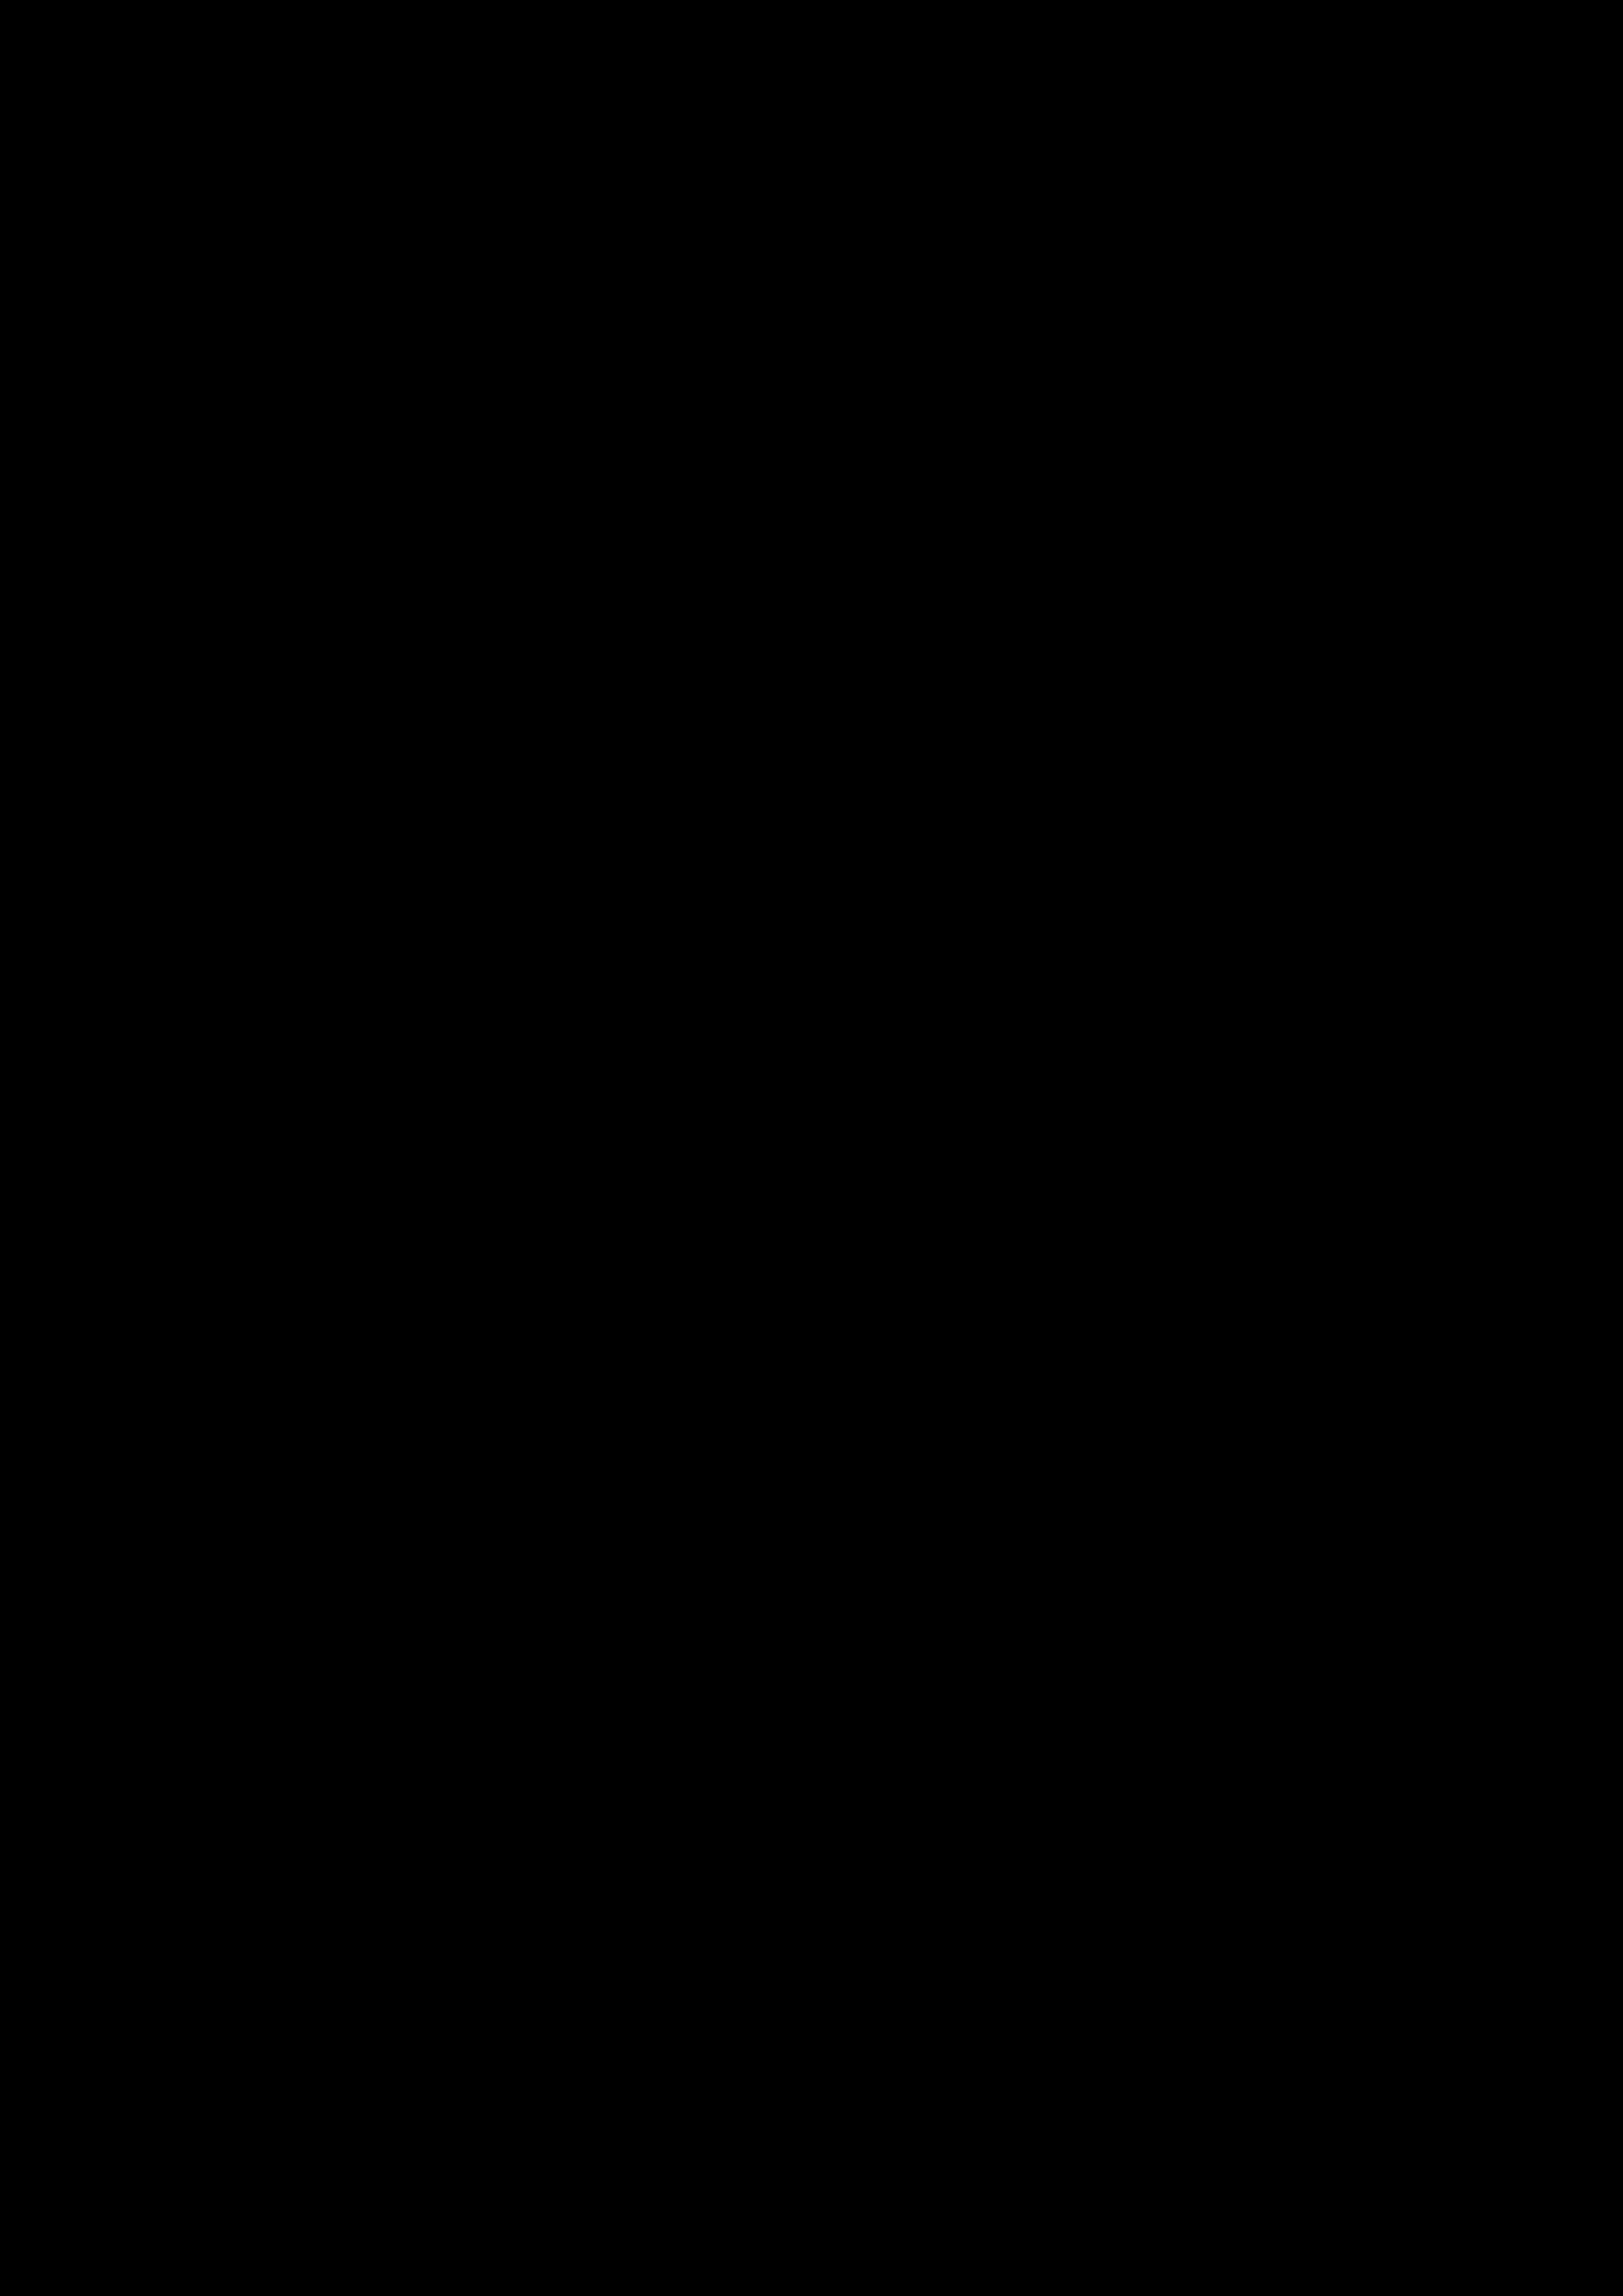 image of thomas farynor 9iHRBGT